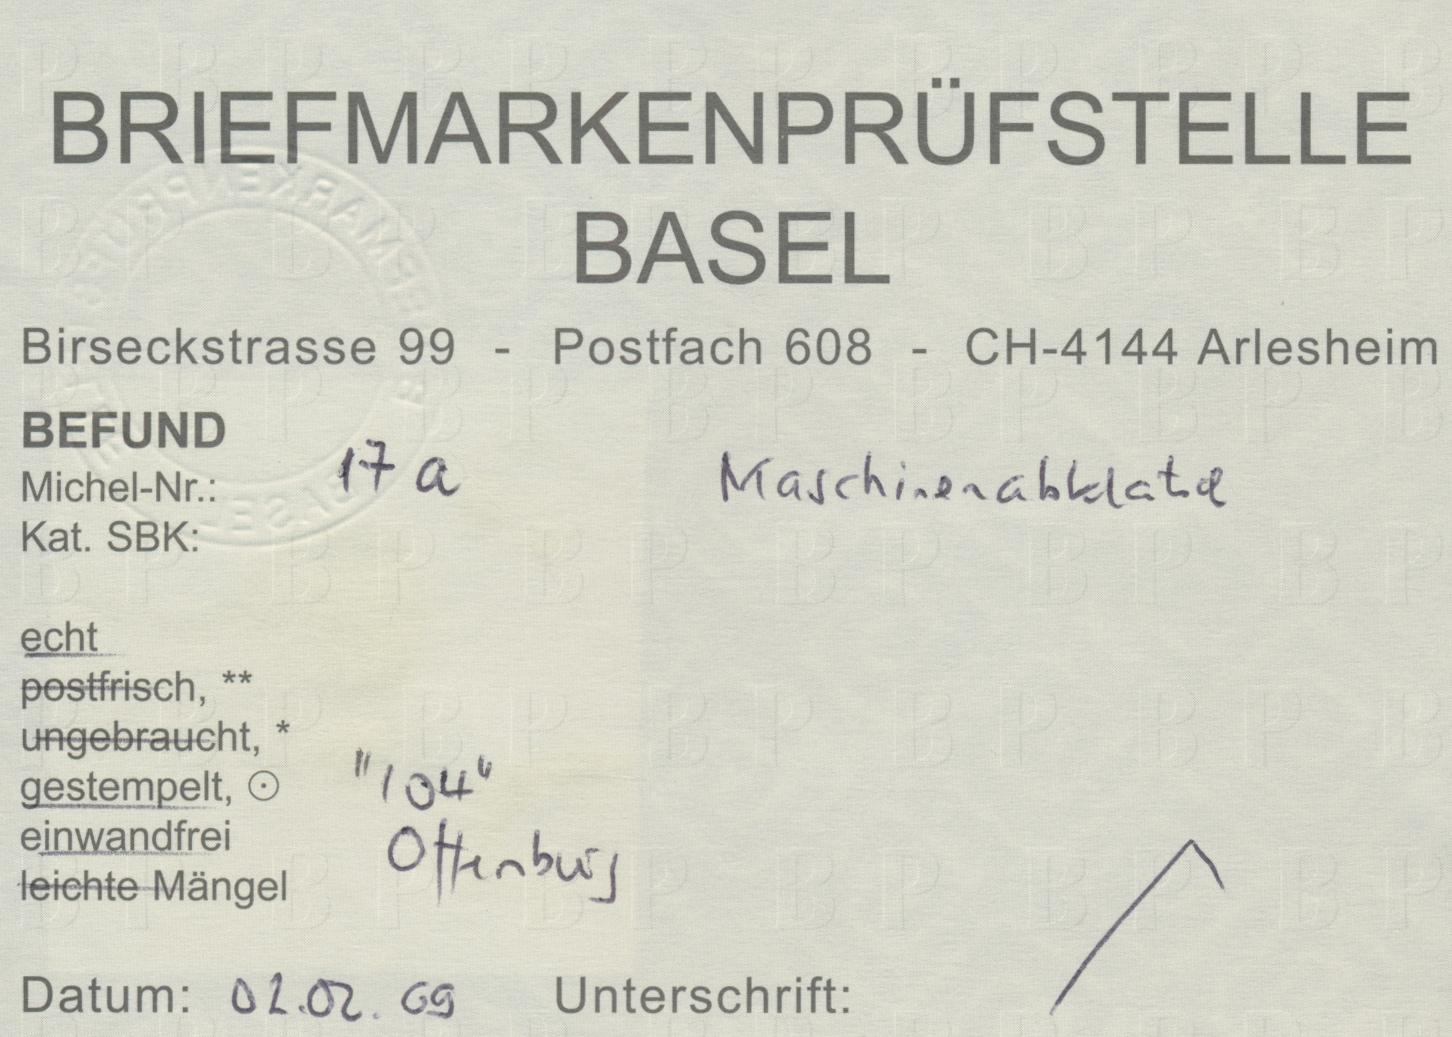 Lot 27396 - Baden - Marken und Briefe  -  Auktionshaus Christoph Gärtner GmbH & Co. KG Sale #46 Gollcetions Germany - including the suplement